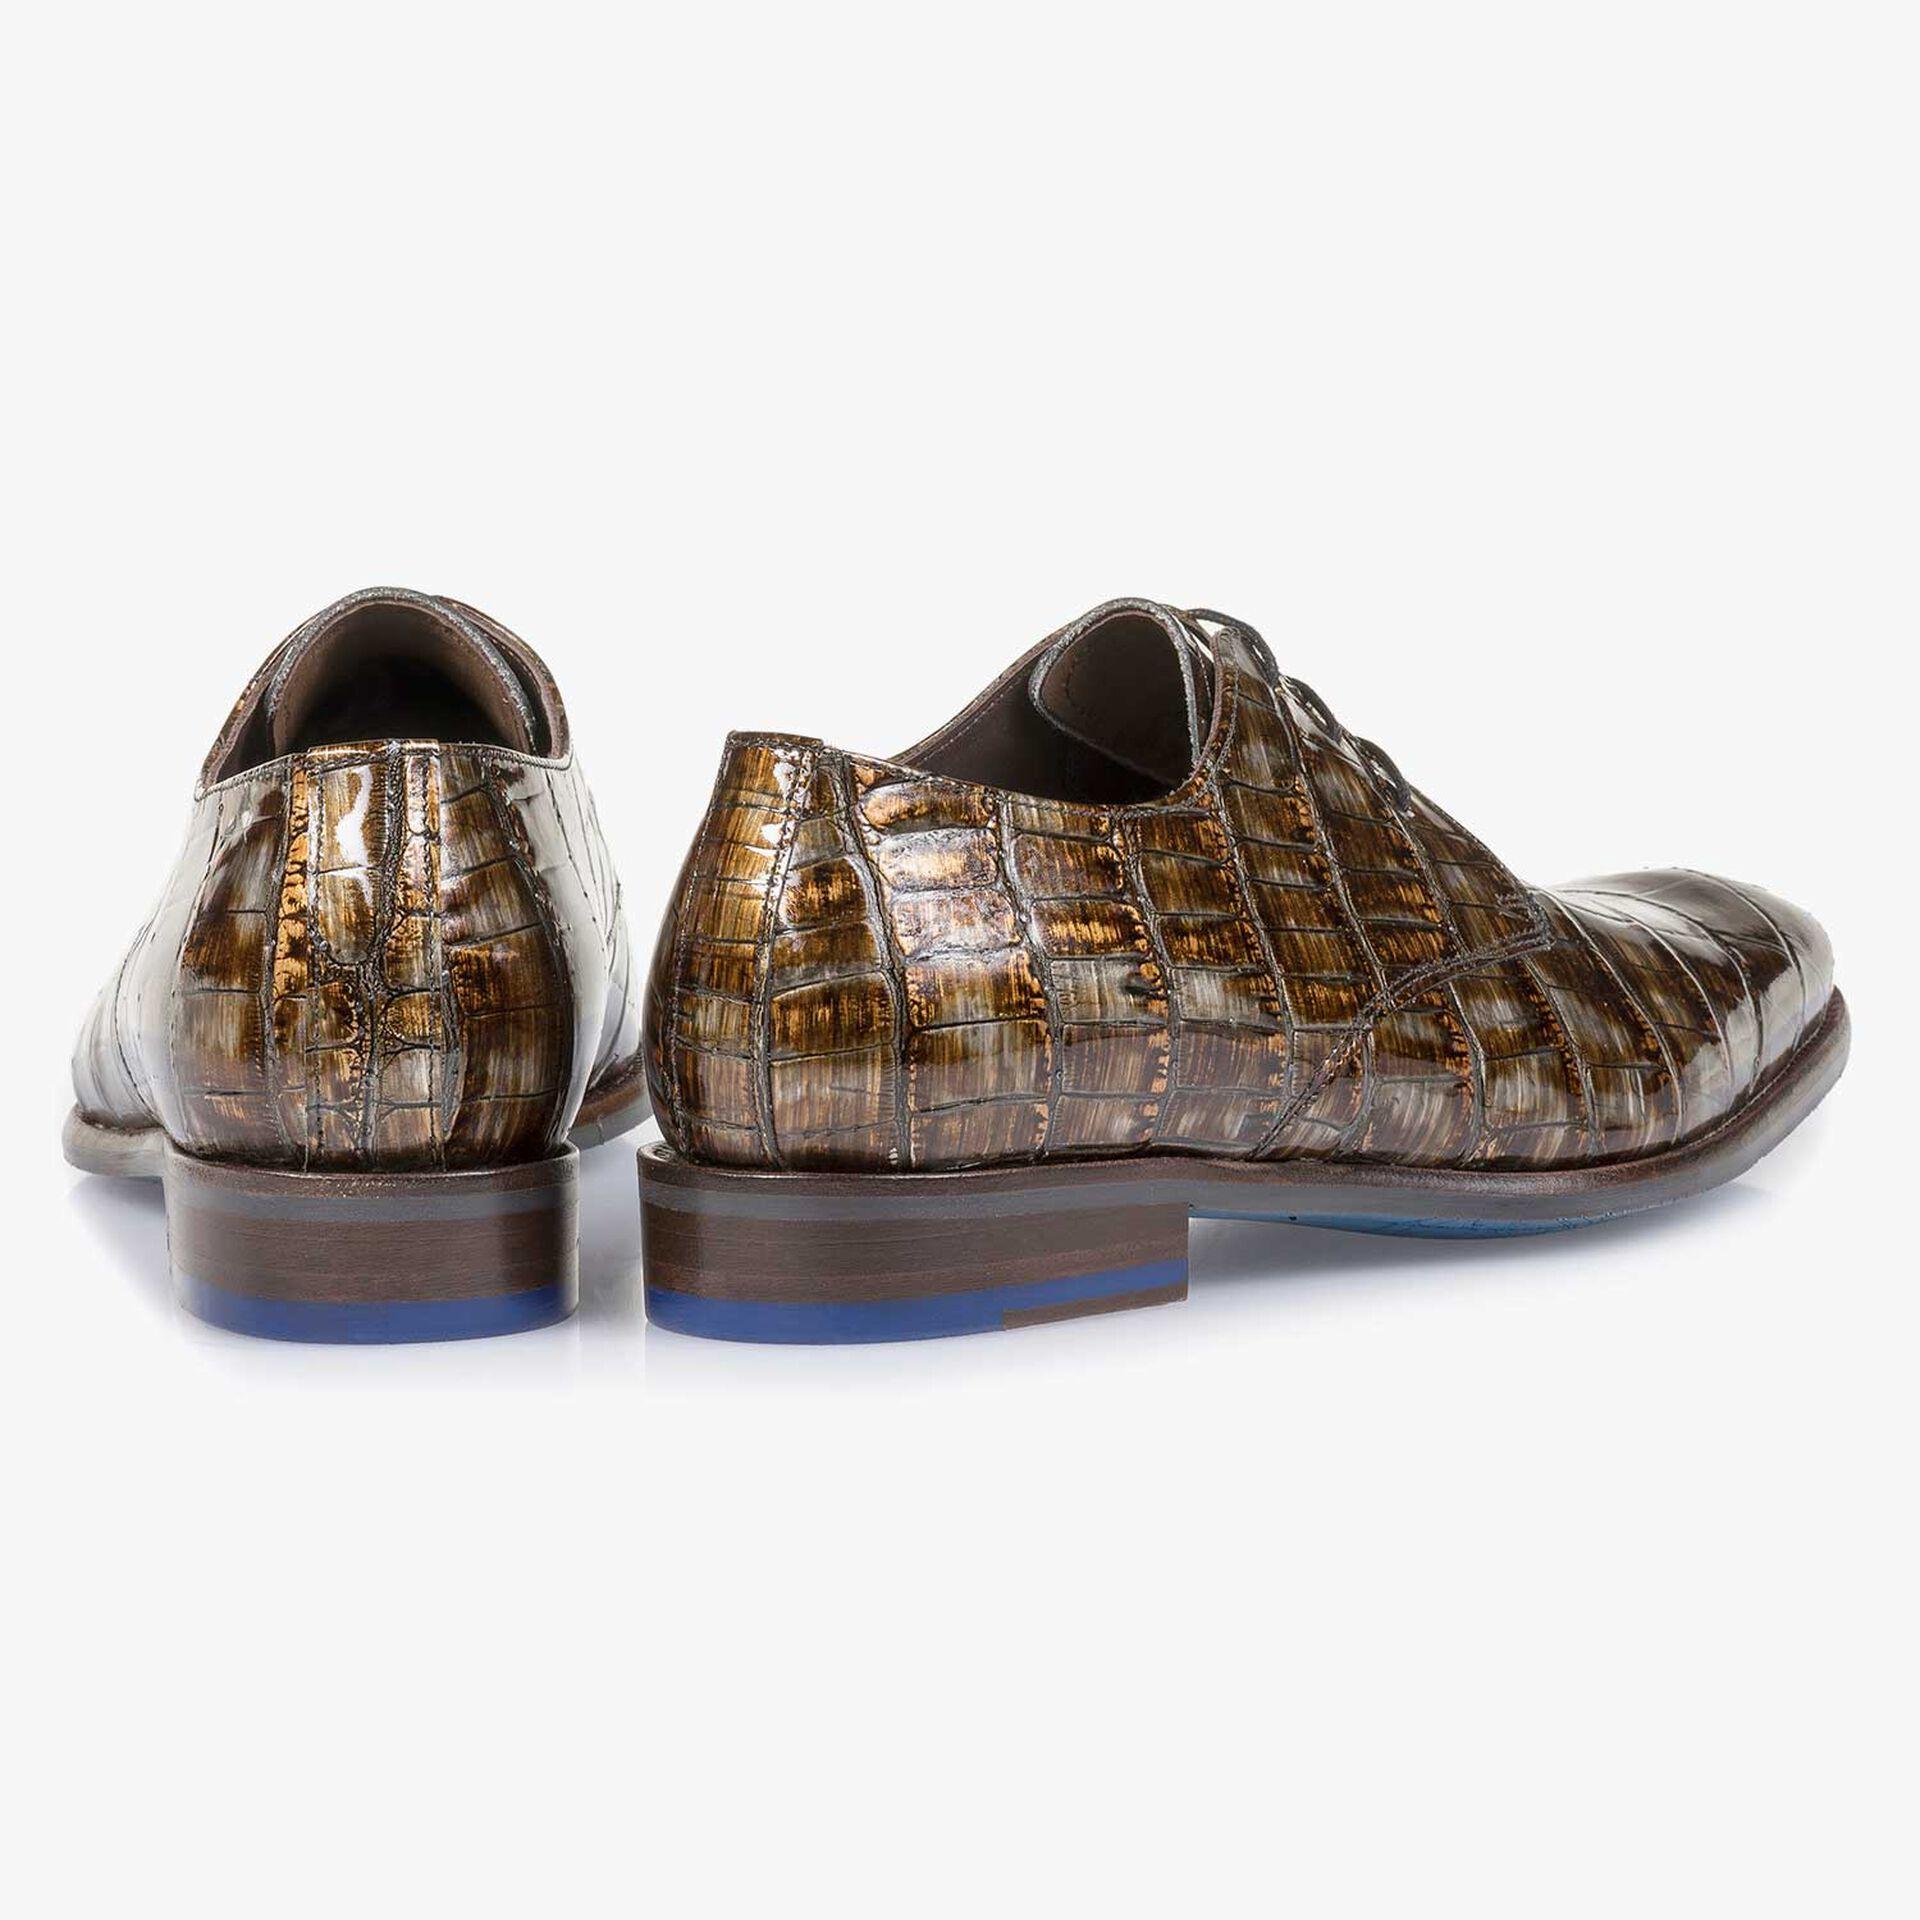 Cognac-coloured lace shoe with a croco print